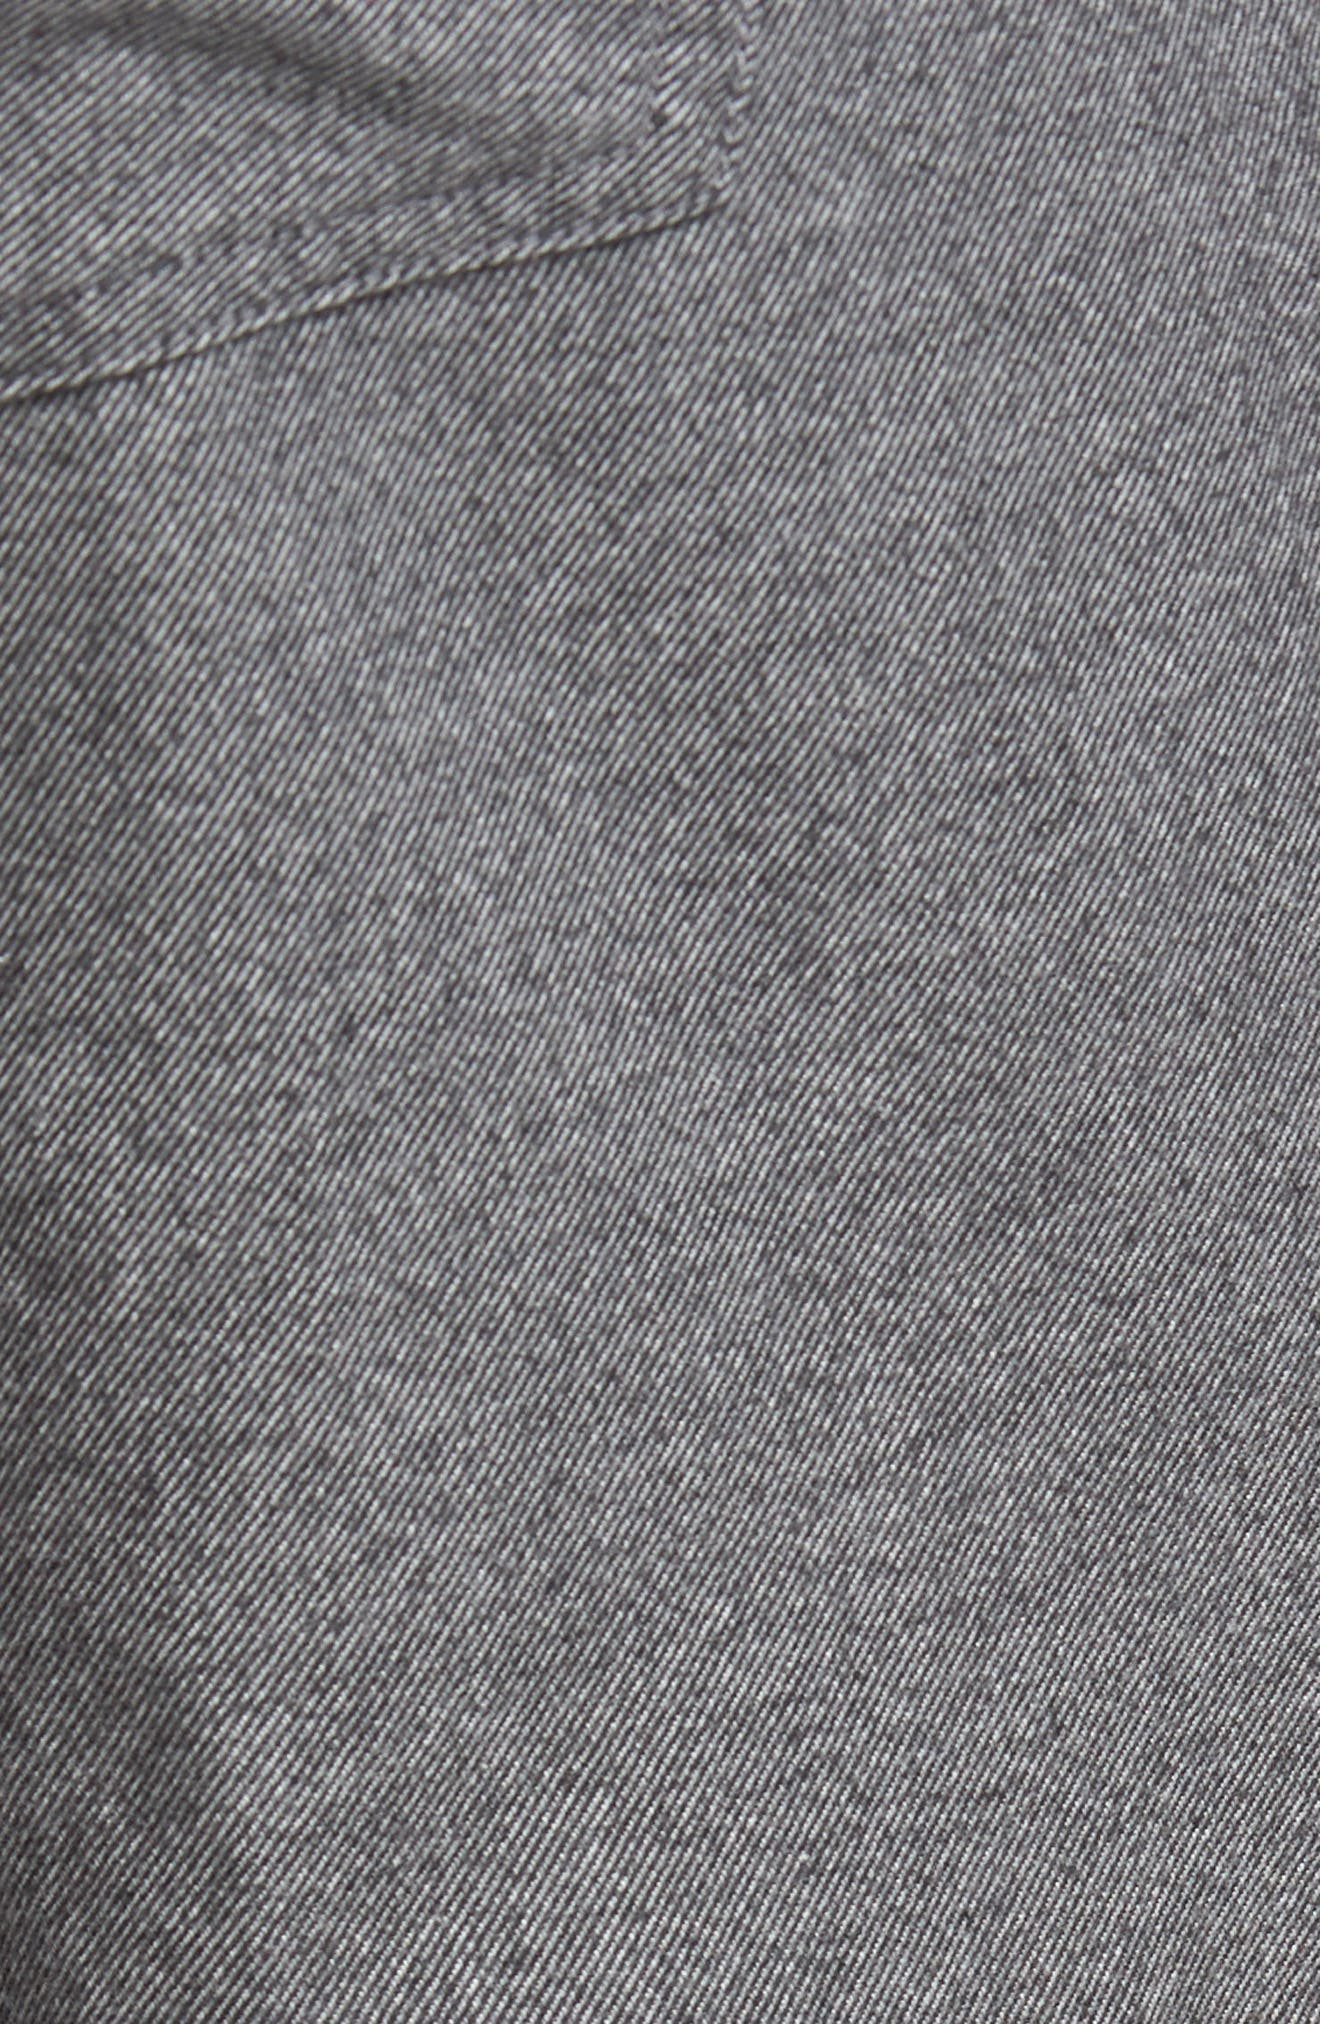 Mountainside Flannel Five-Pocket Pants,                             Alternate thumbnail 5, color,                             033